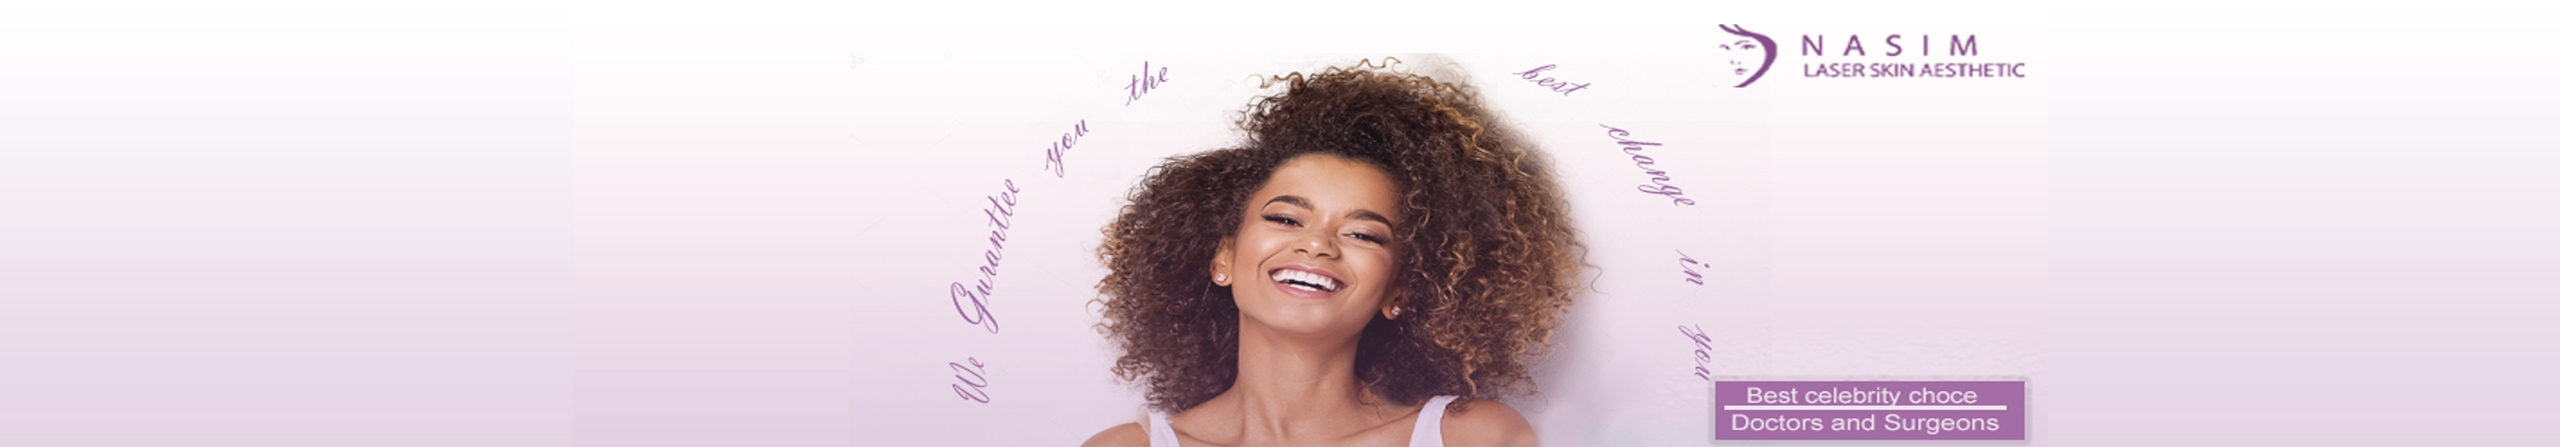 Skin Care - Nasim laser skin aes (@nasimlaserskin) Cover Image